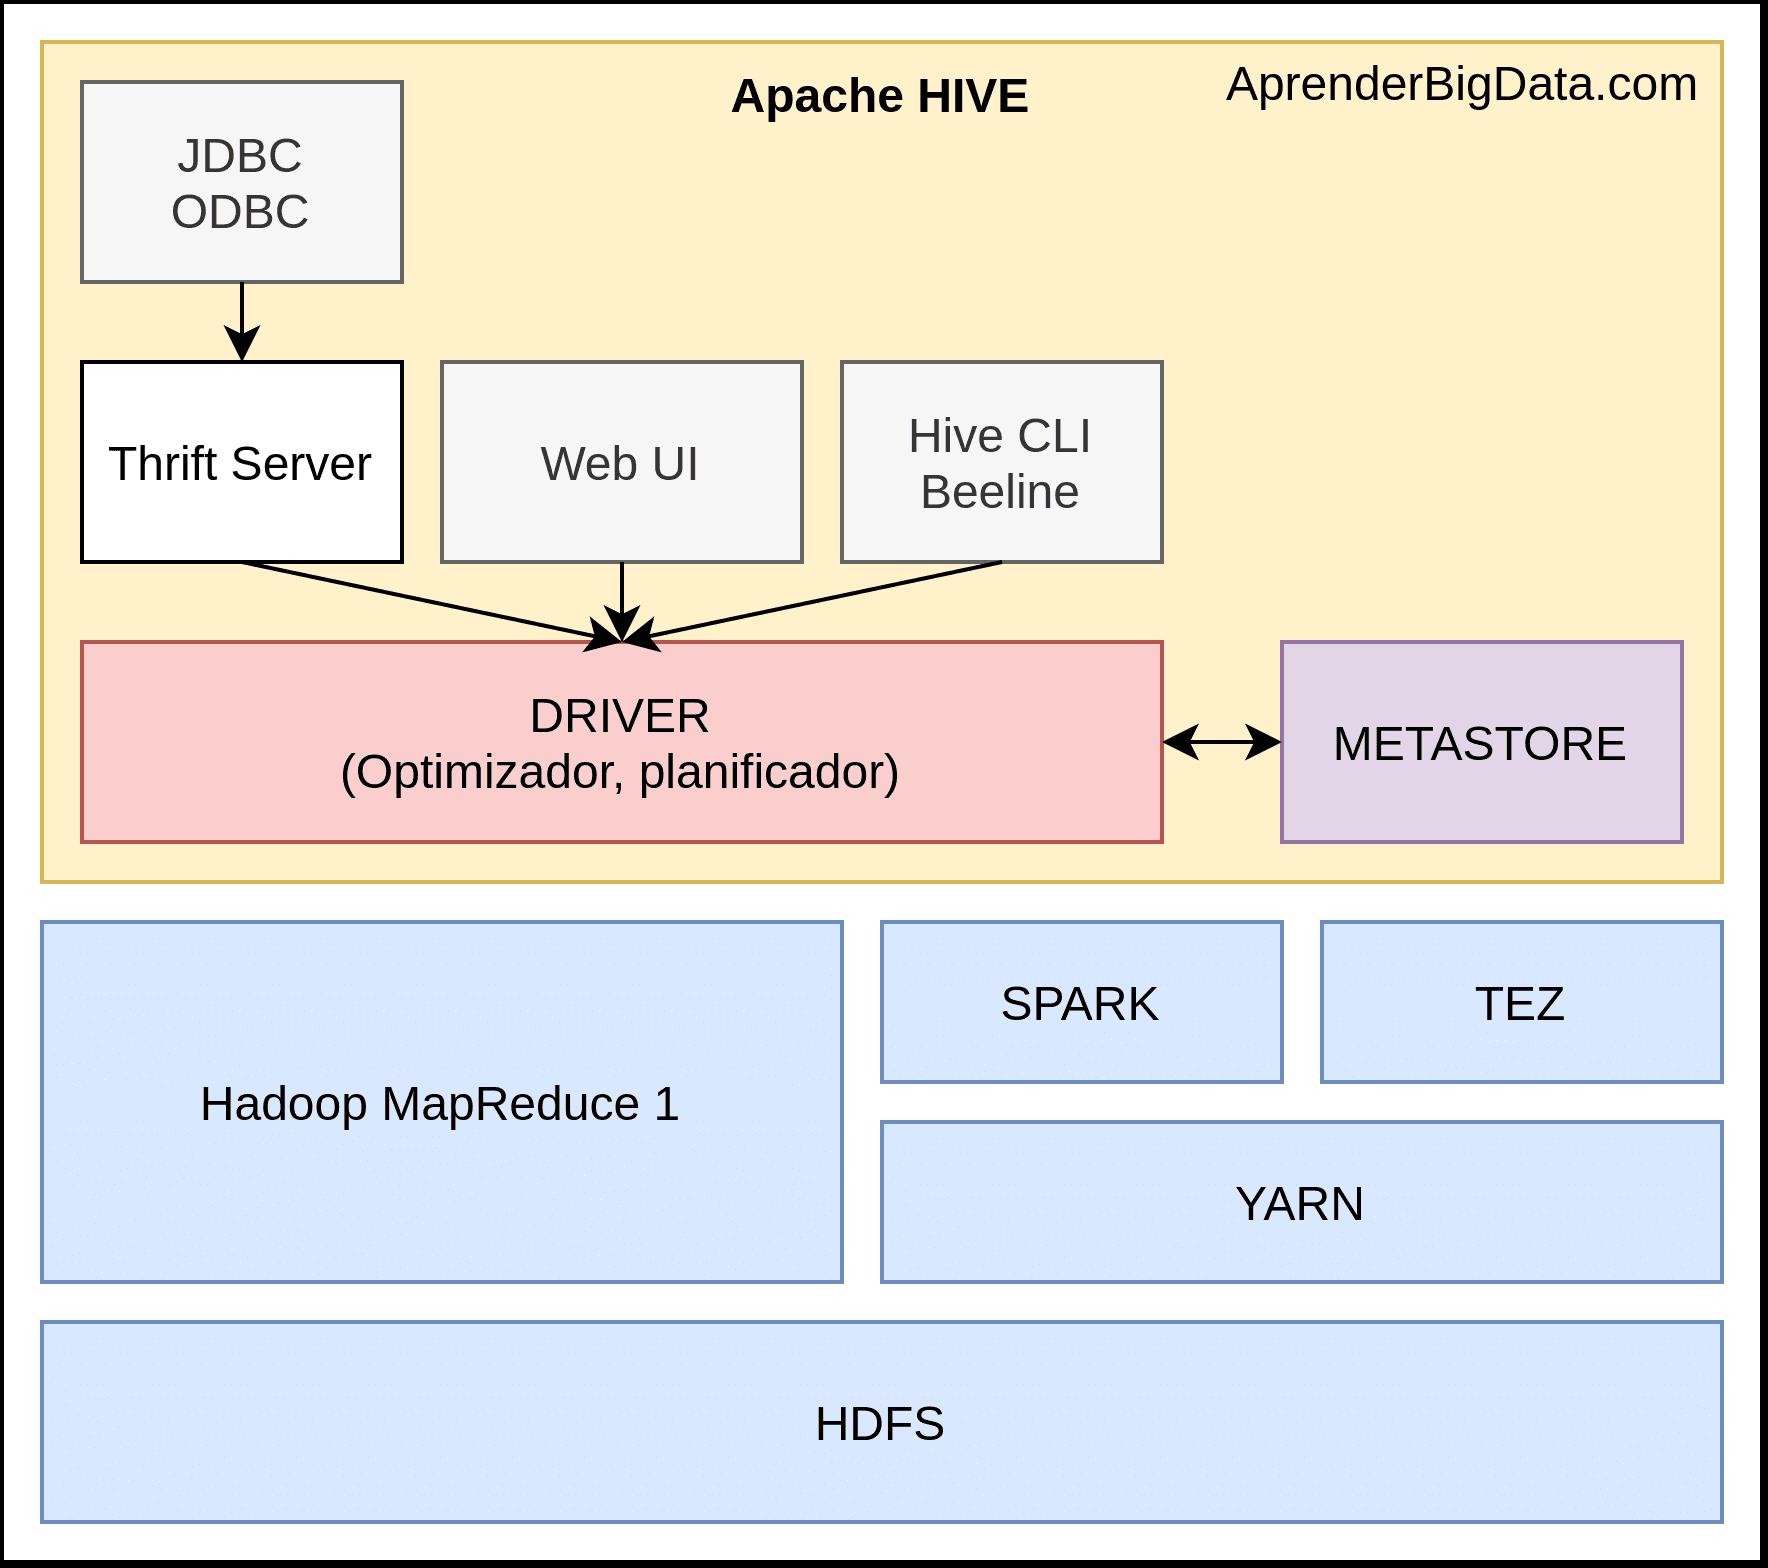 Arquitectura componentes Apache Hive